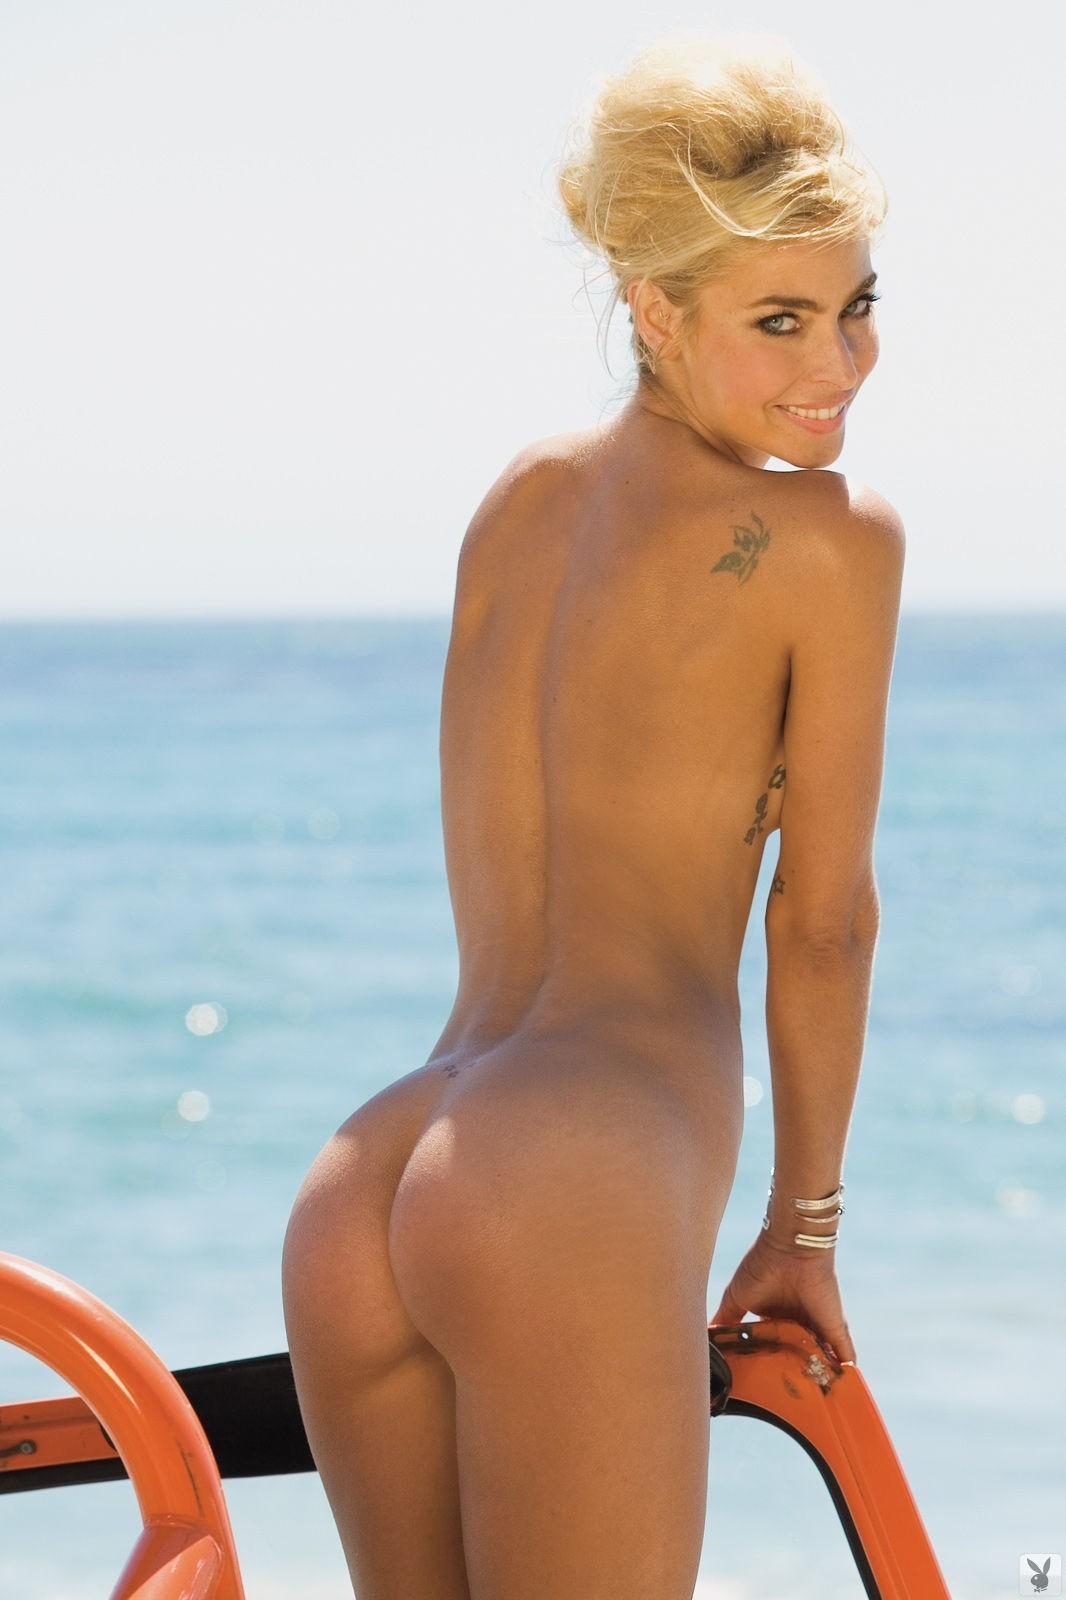 Sexy nicollette sheridan nude